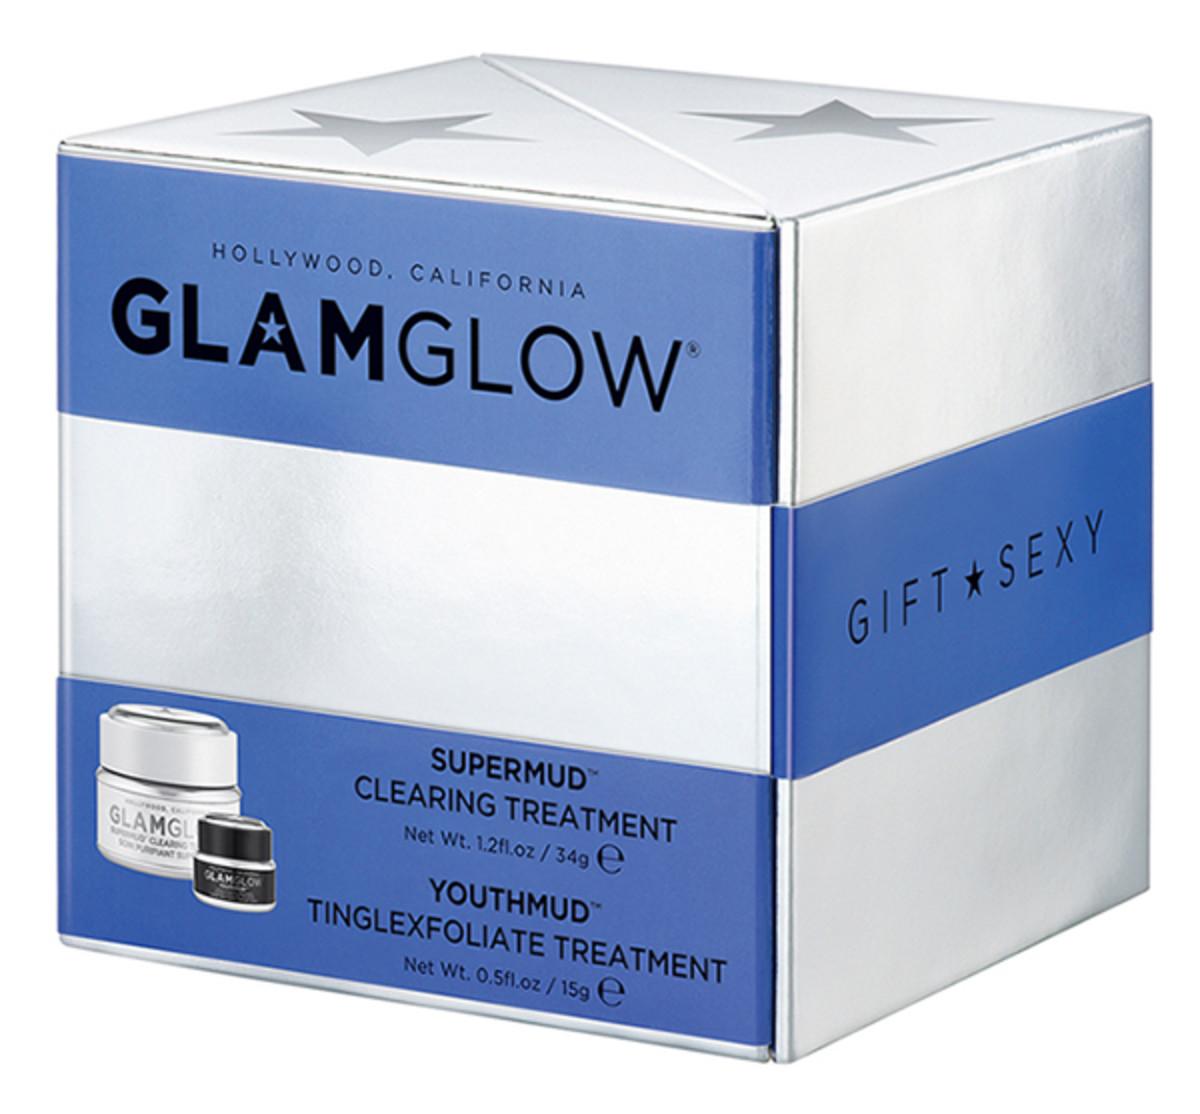 GlamGlow Gift Sexy